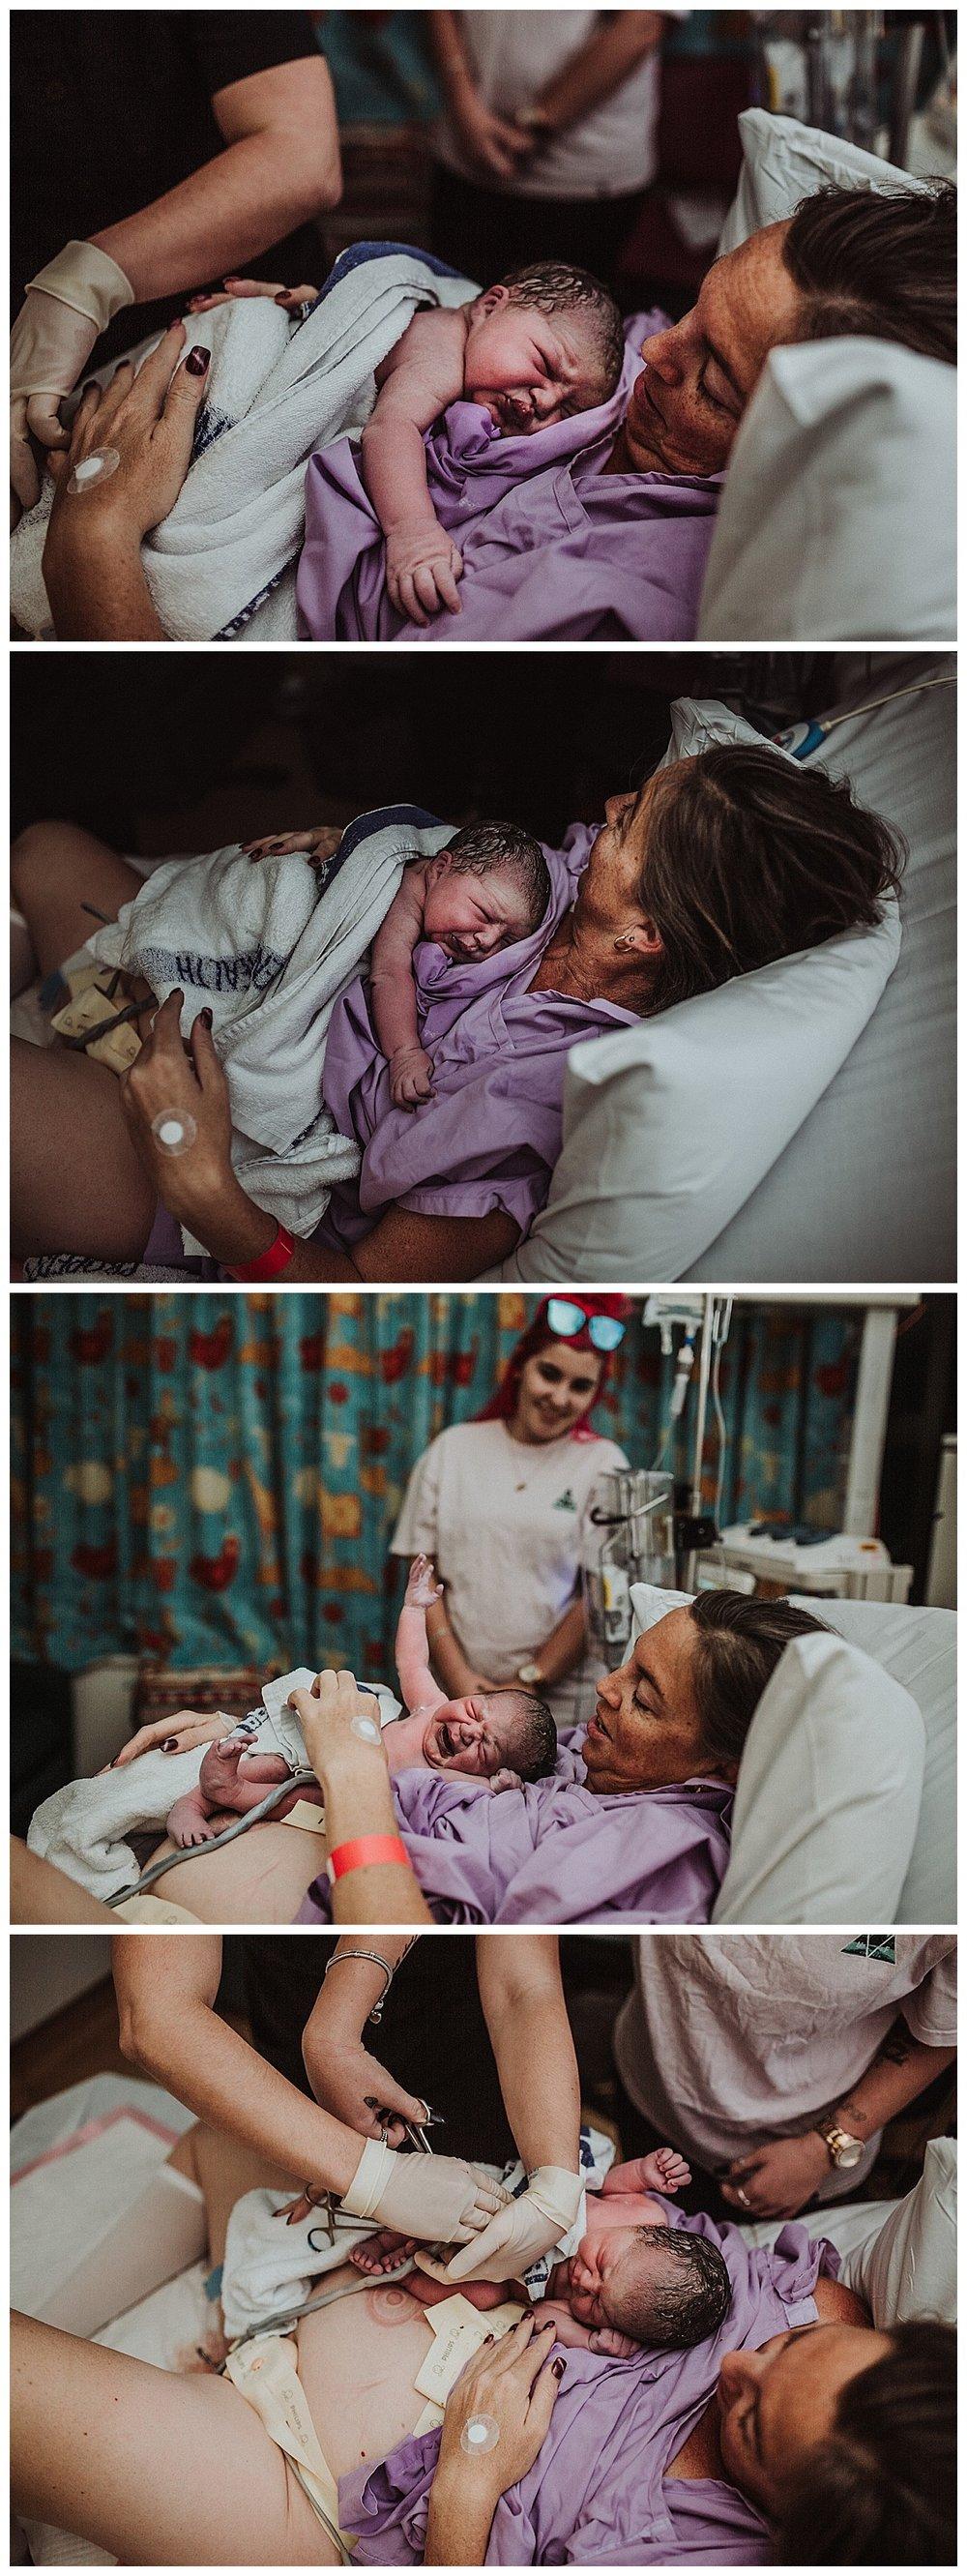 Townsville-hospital-birthing-unit-just-born-baby-nurse-midwife